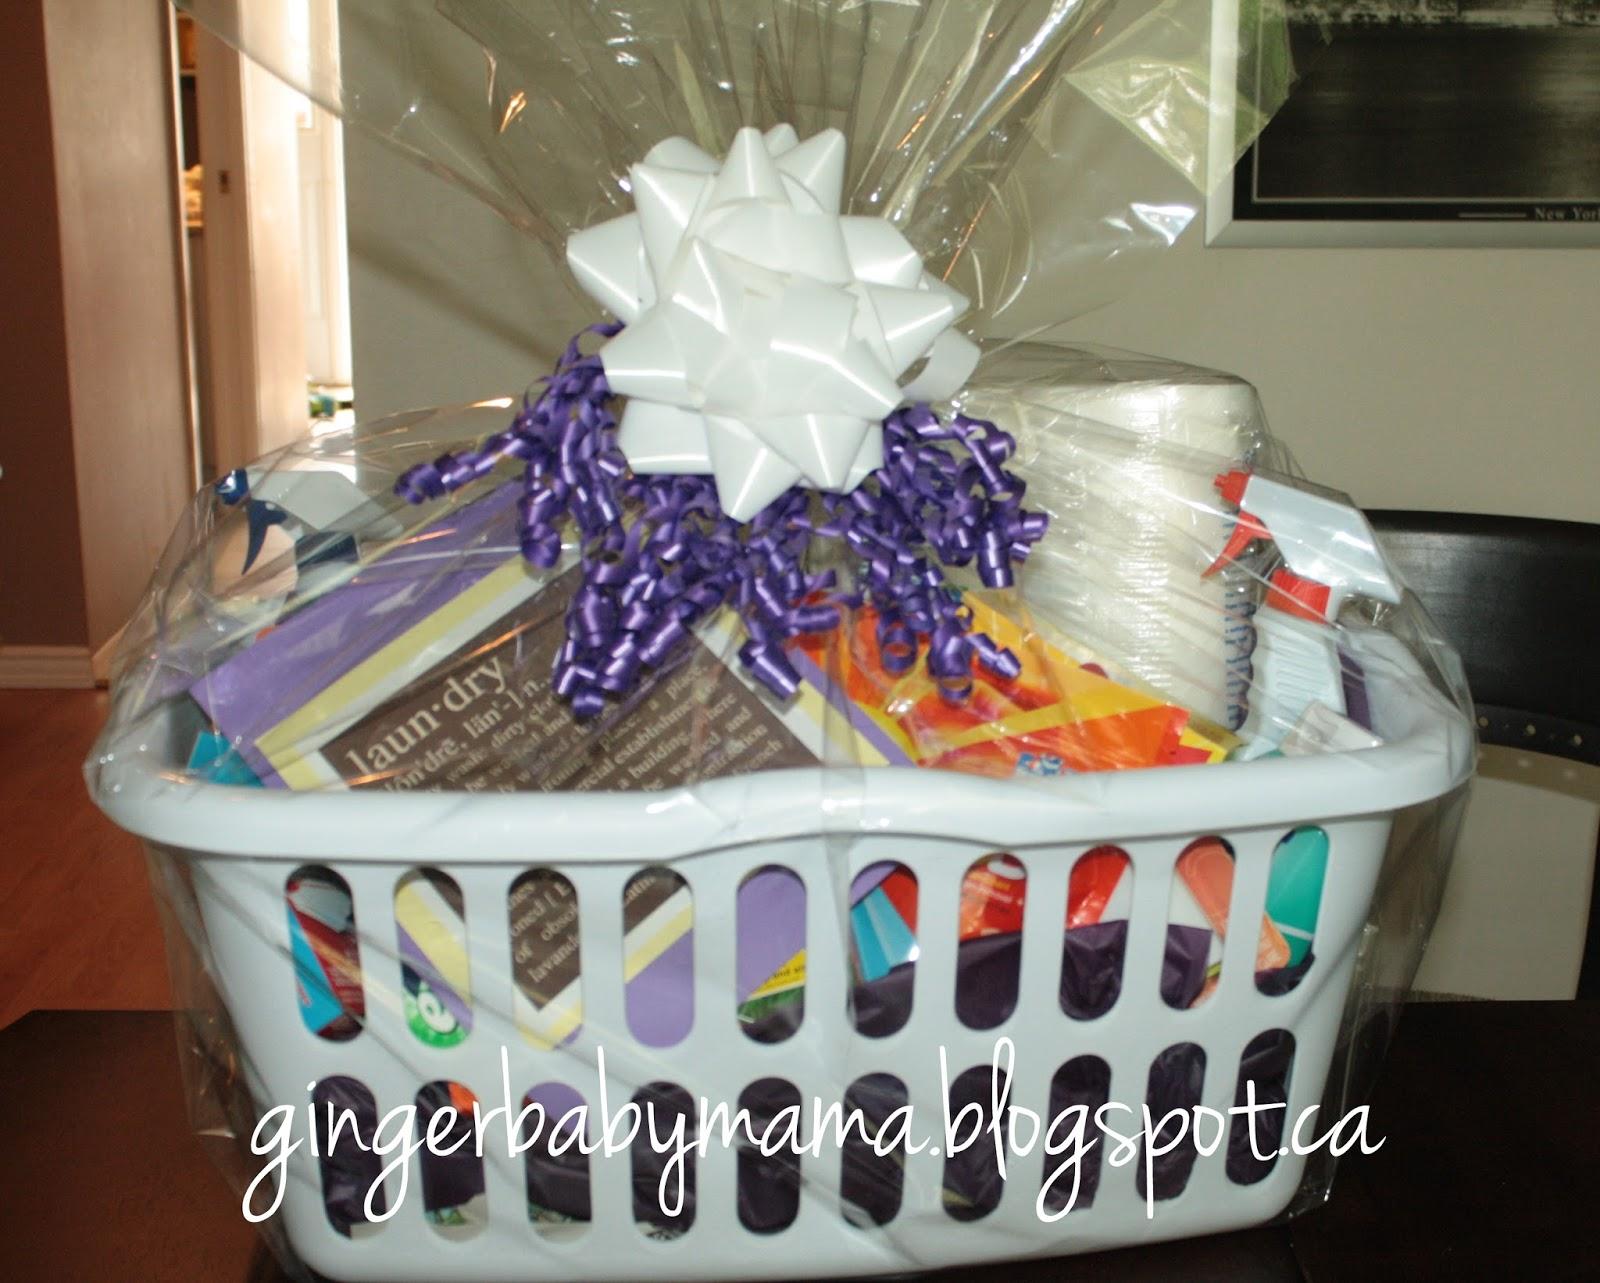 GingerBabyMama: Fun, Practical Bridal Shower Gift